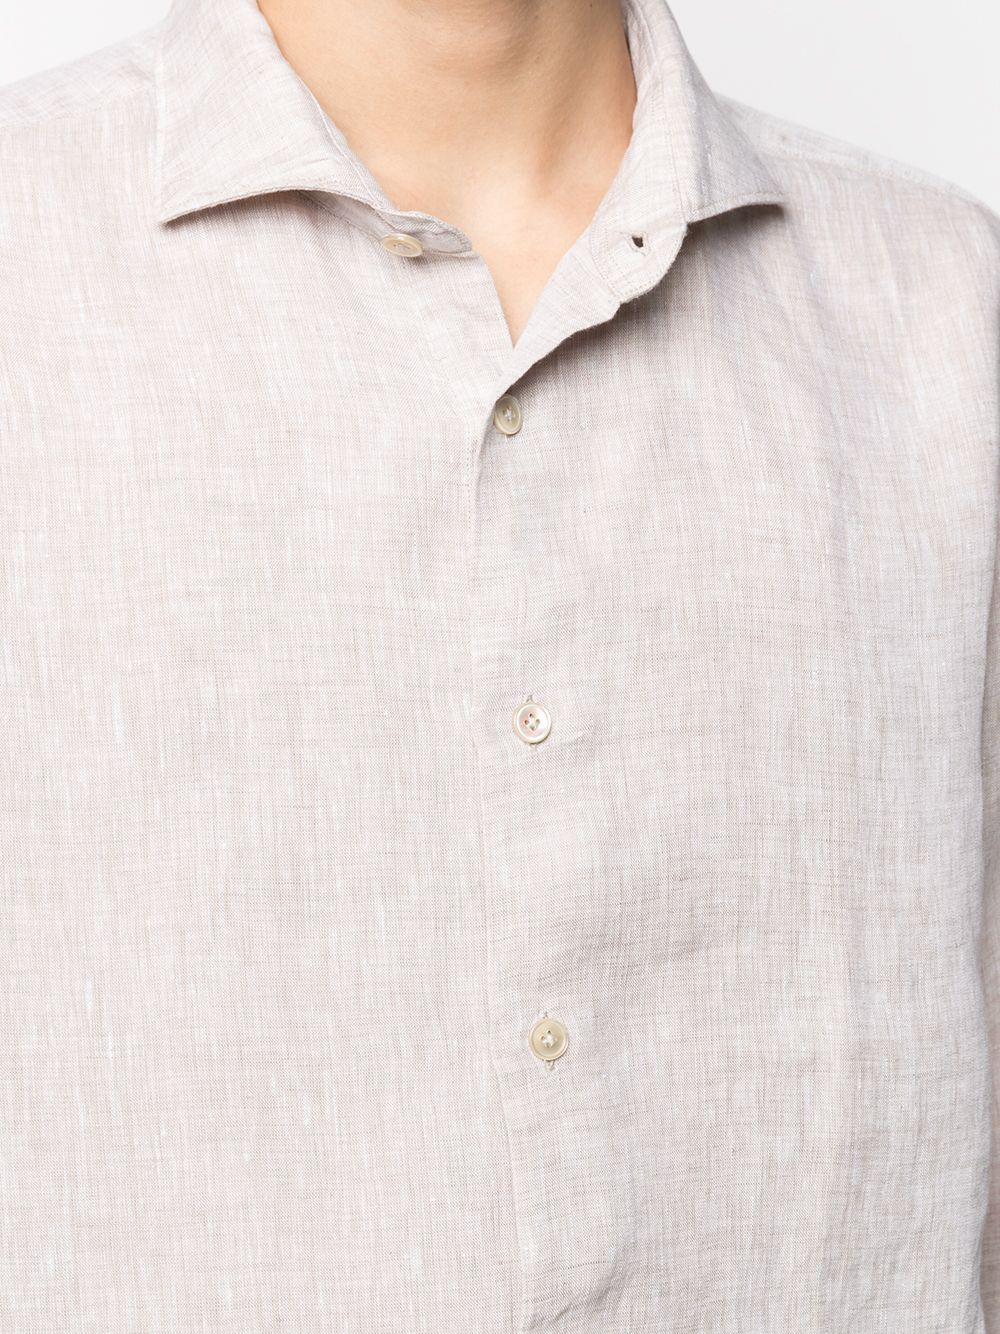 Neutral linen long-sleeve shirt featuring classic collar ELEVENTY |  | C75CAMA05-TES0A00102